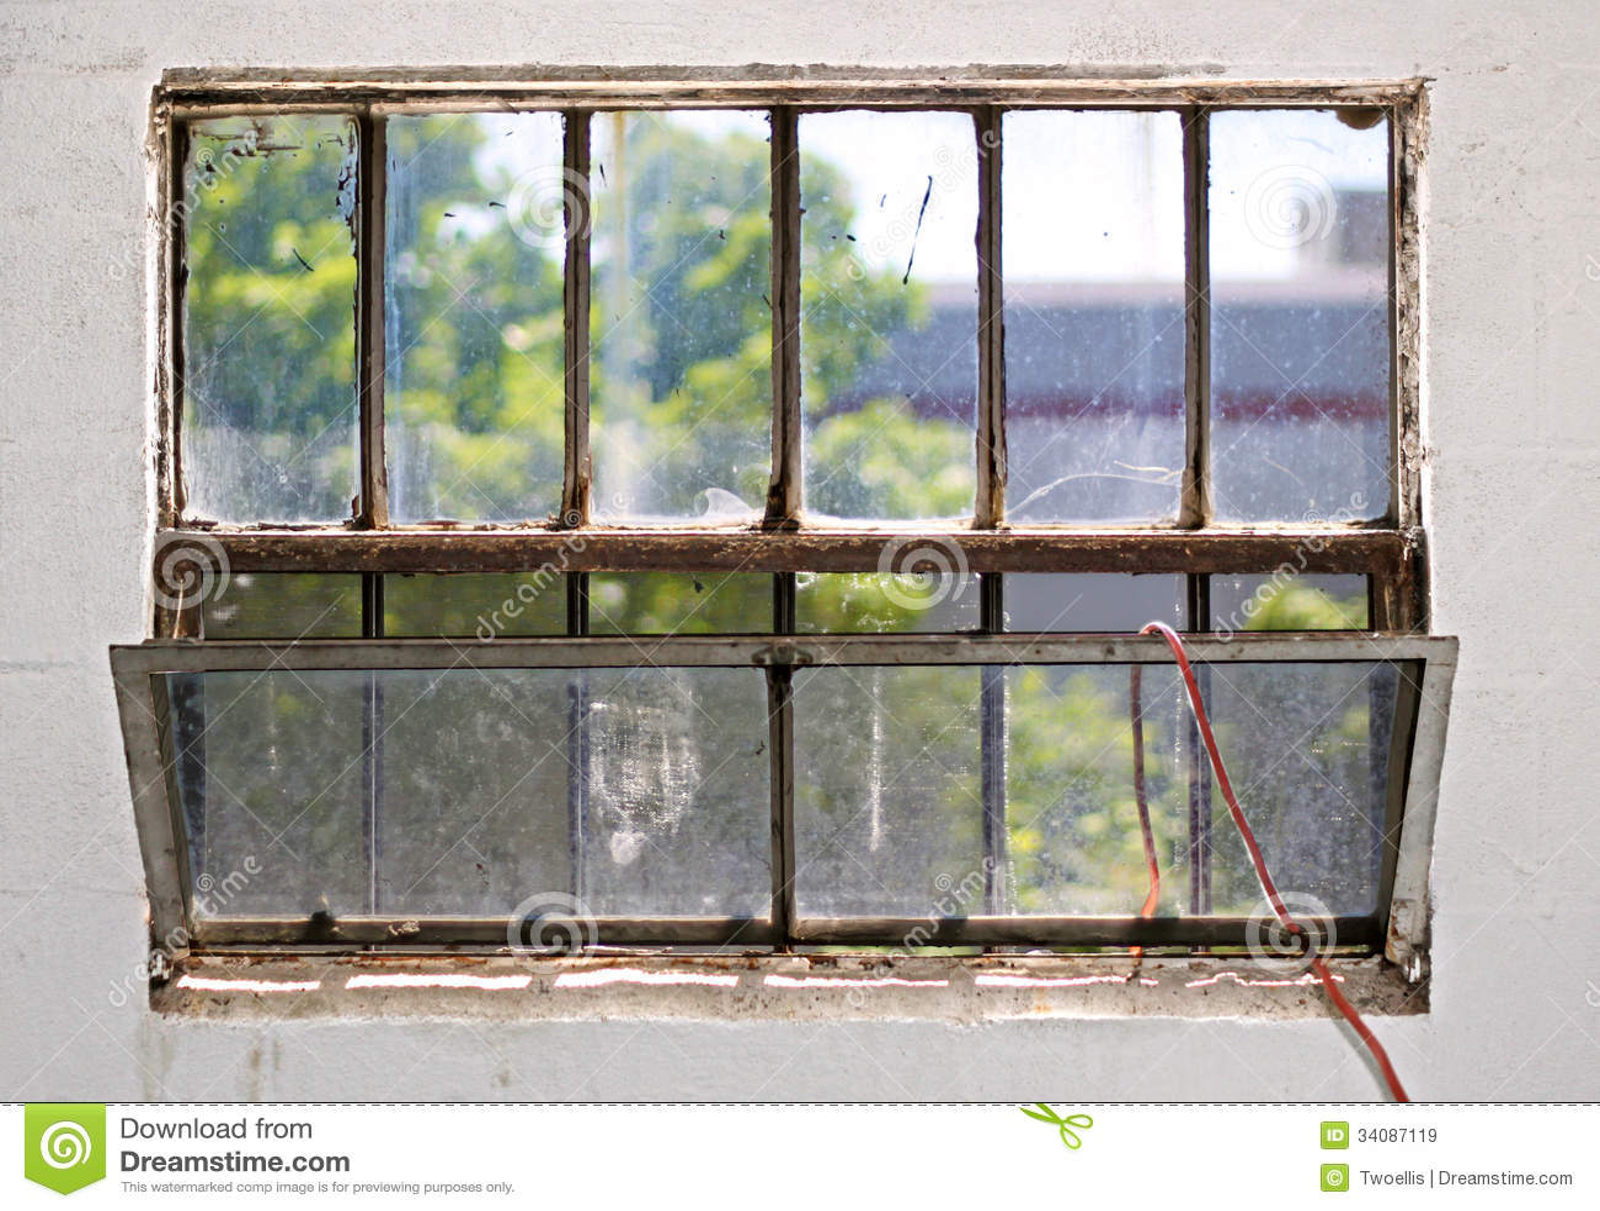 grungy dirty rust basement casement window with an old red garden